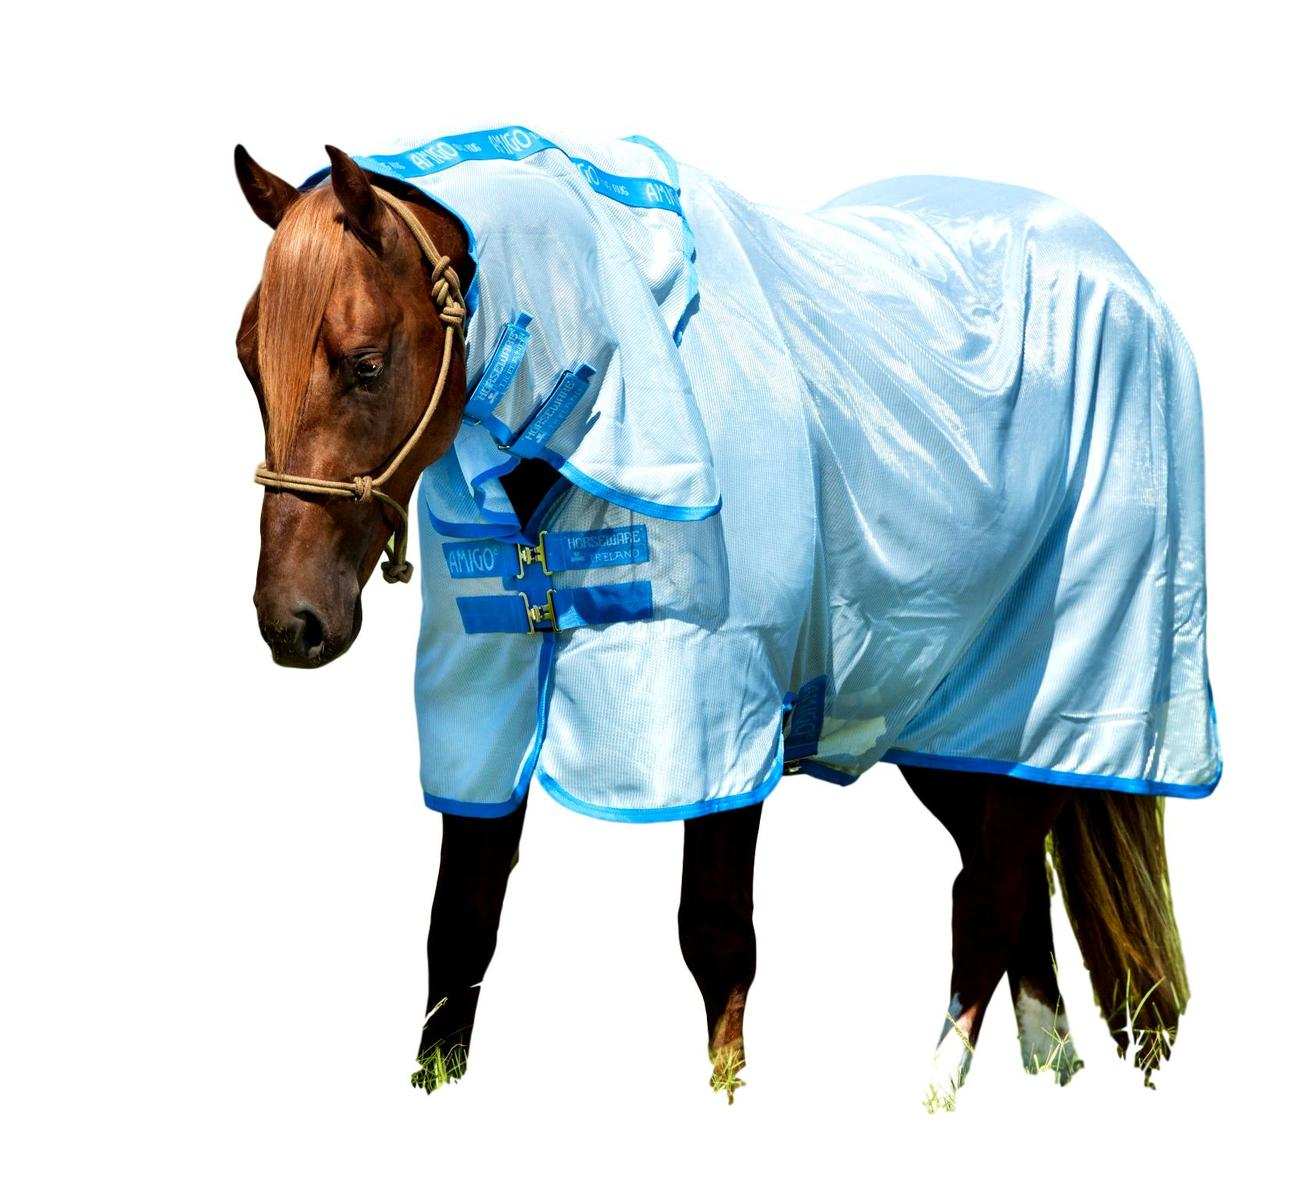 Horseware-Ireland-Amigo-Bug-Blanket-Fly-Sheet-with-Removable-Neck thumbnail 4